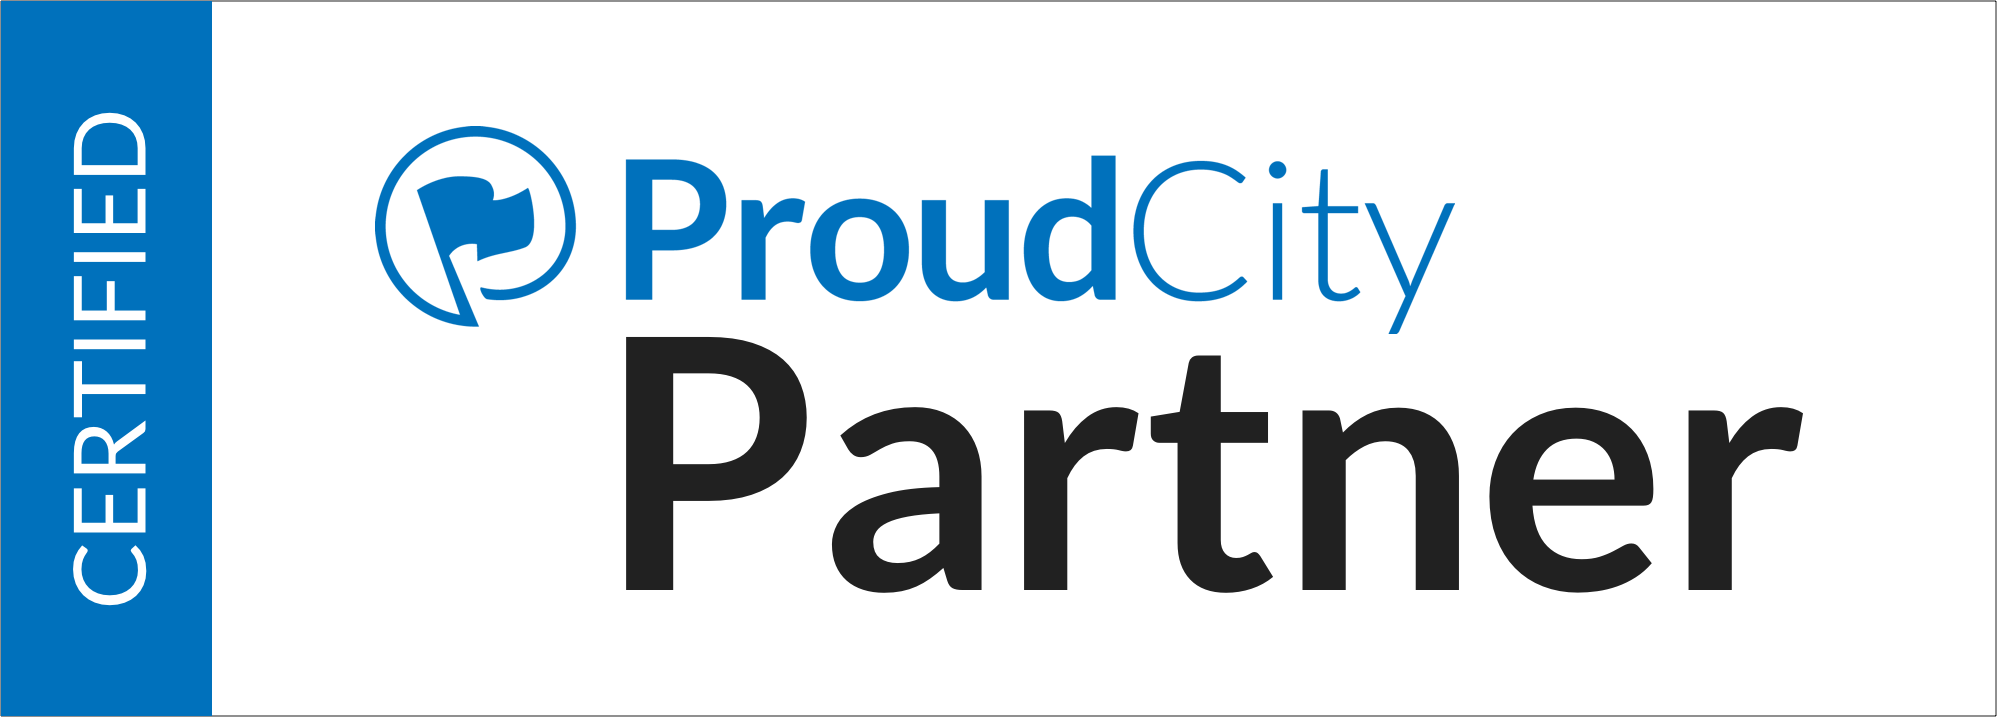 ProudCity Certified Service Partner